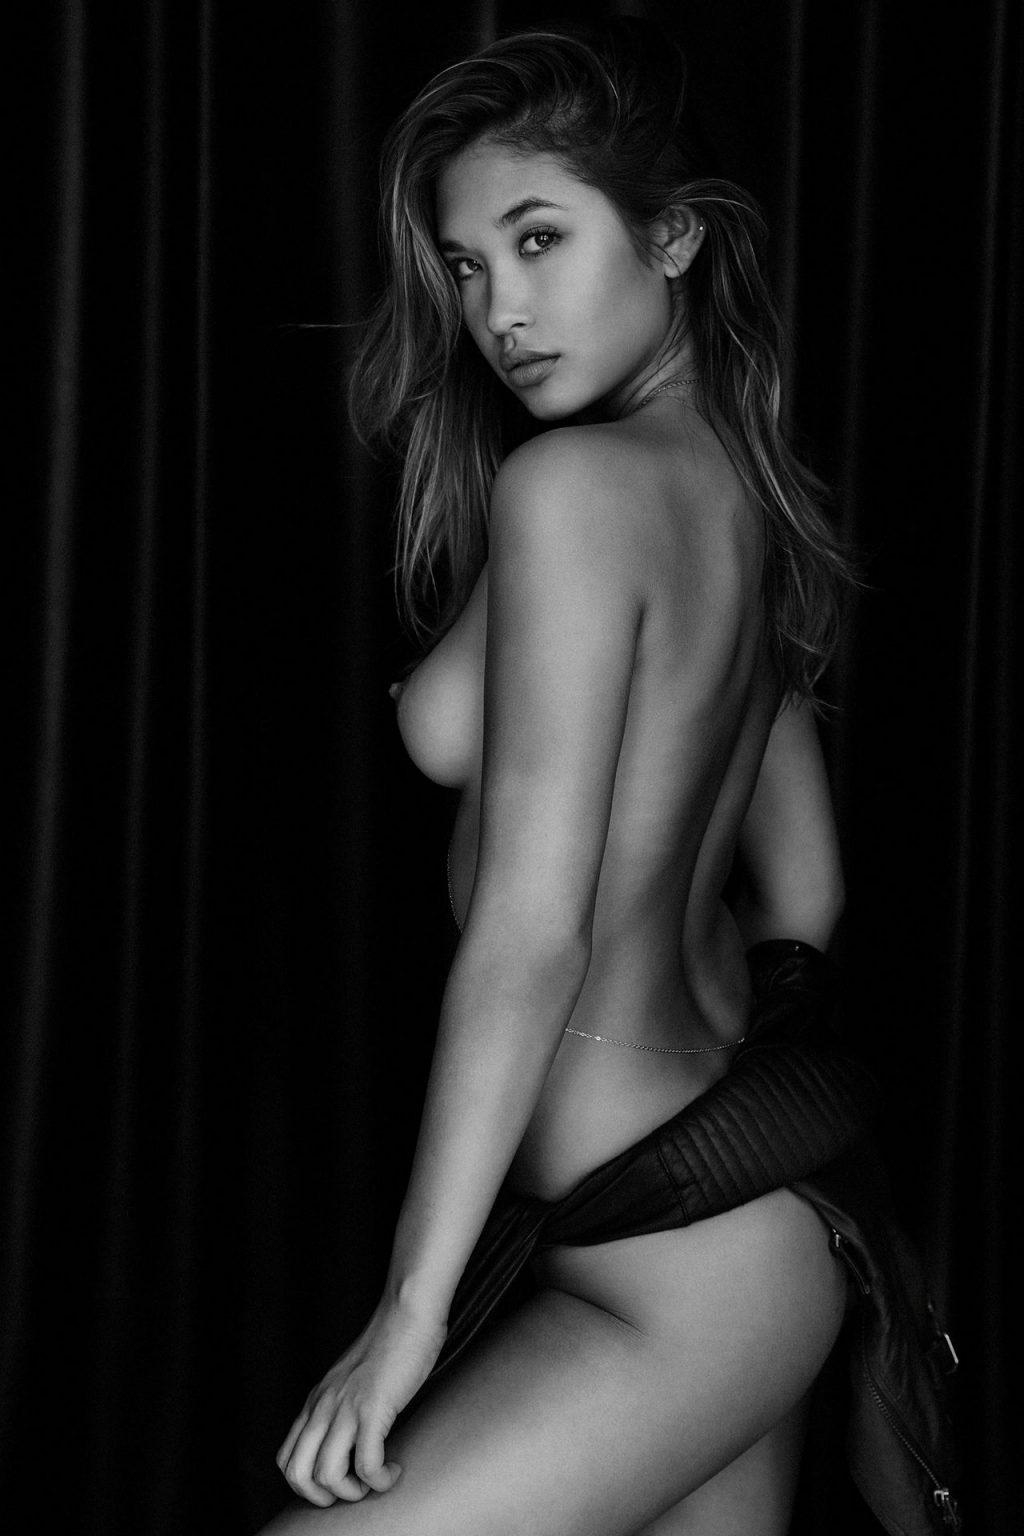 Jocelyn Chew Topless (2 Photos)